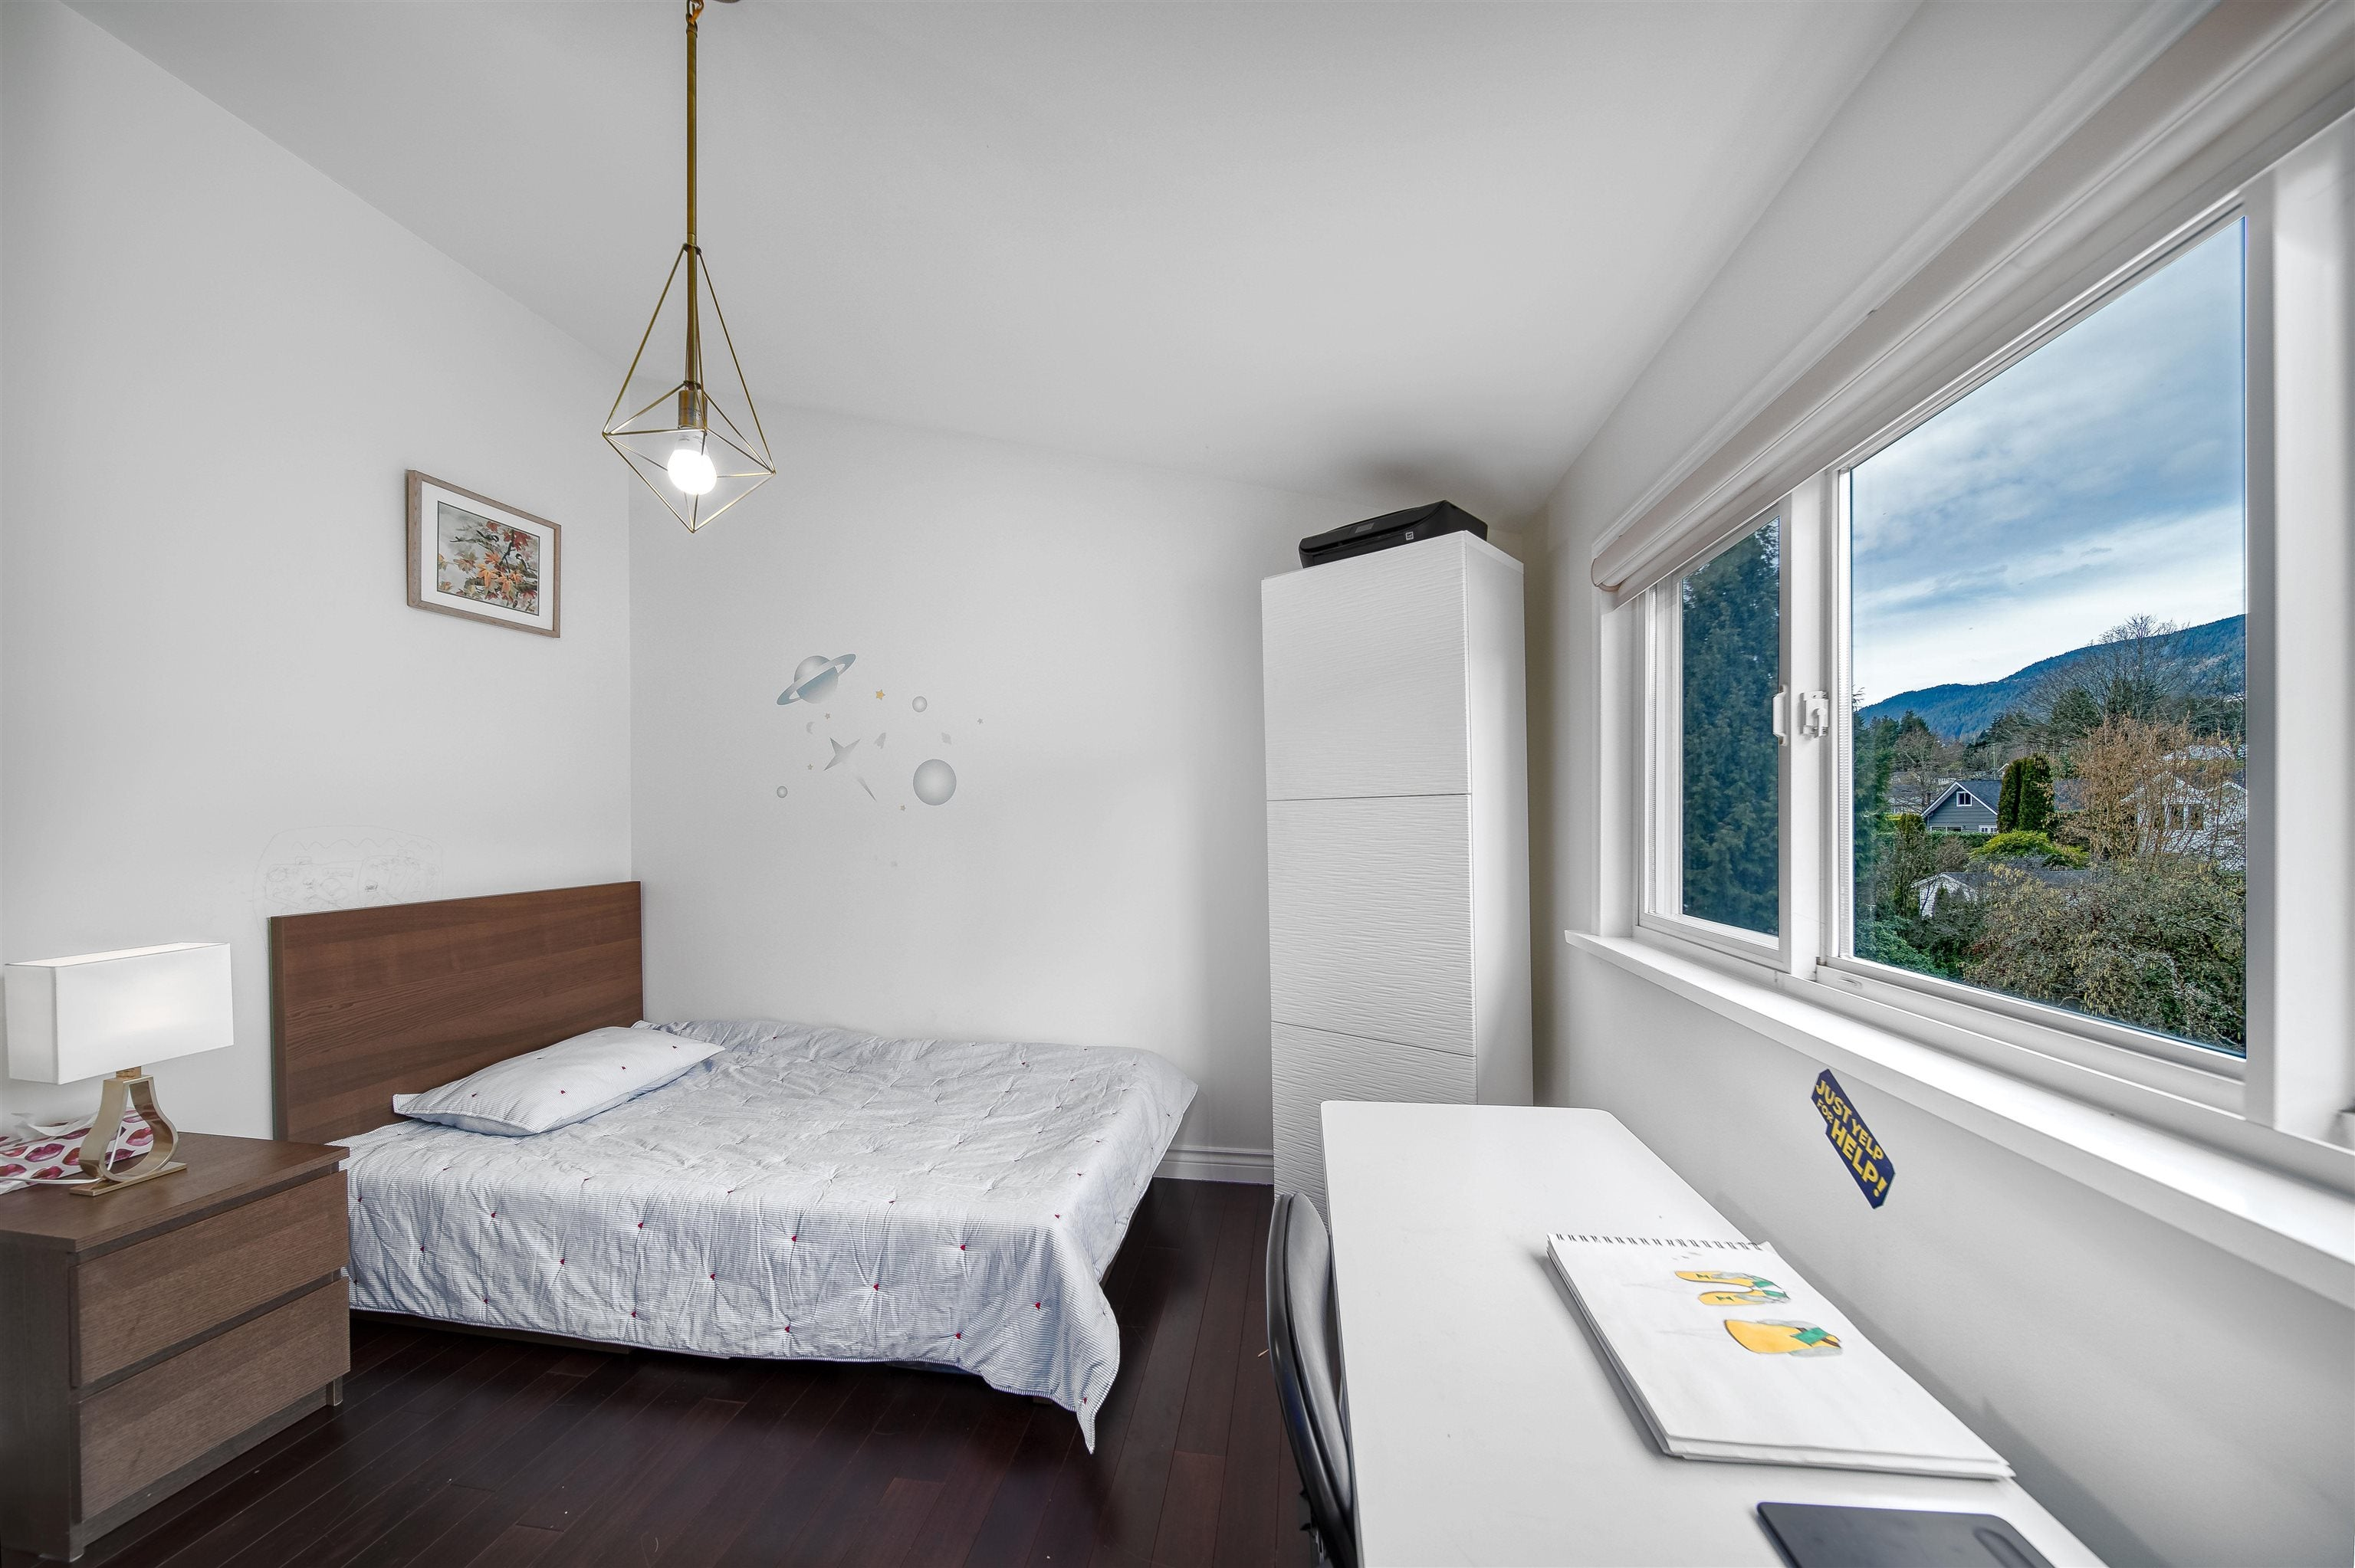 1357 FULTON AVENUE - Ambleside House/Single Family for sale, 6 Bedrooms (R2617731) - #20